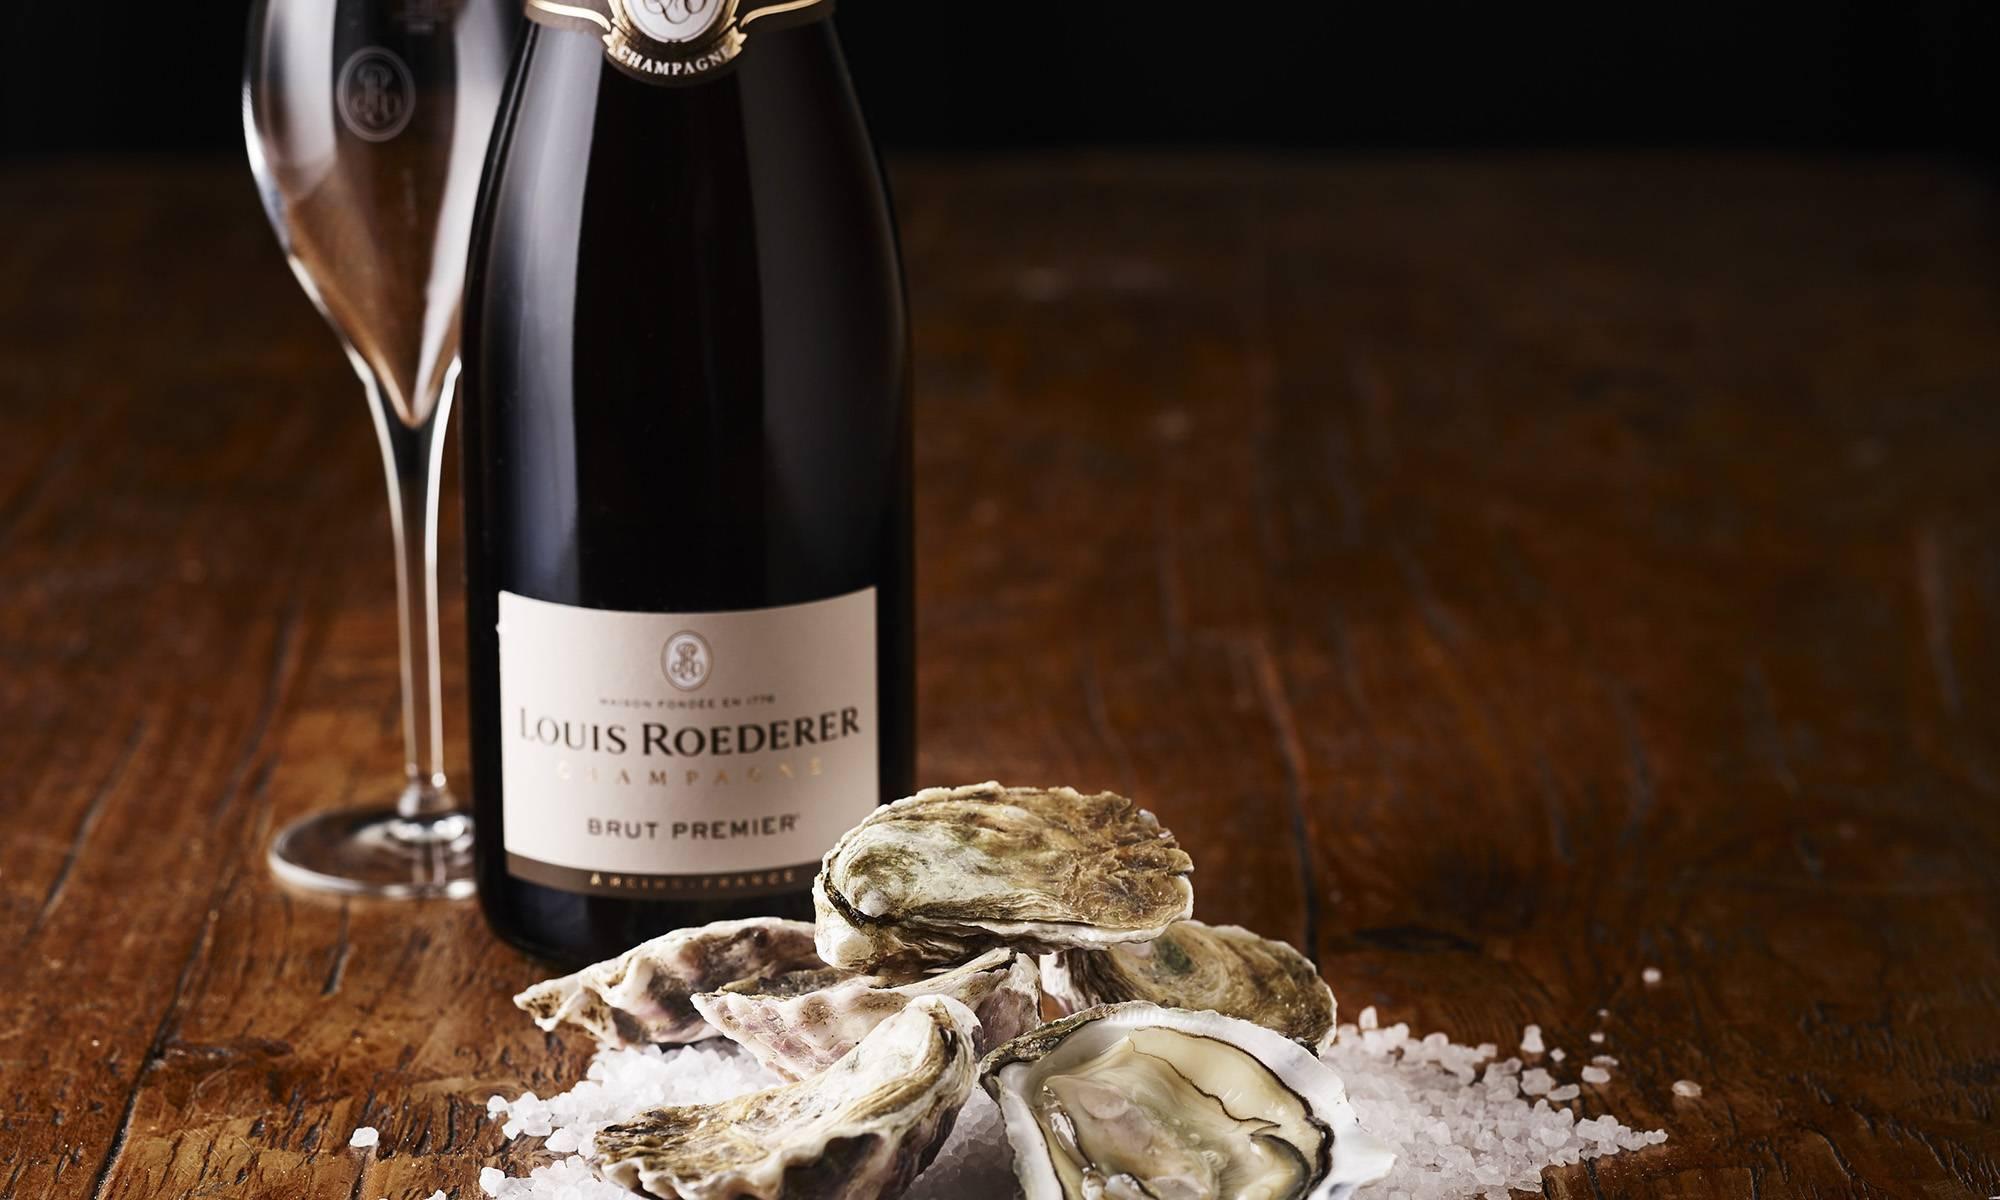 Рейтинг дорогого шампанского